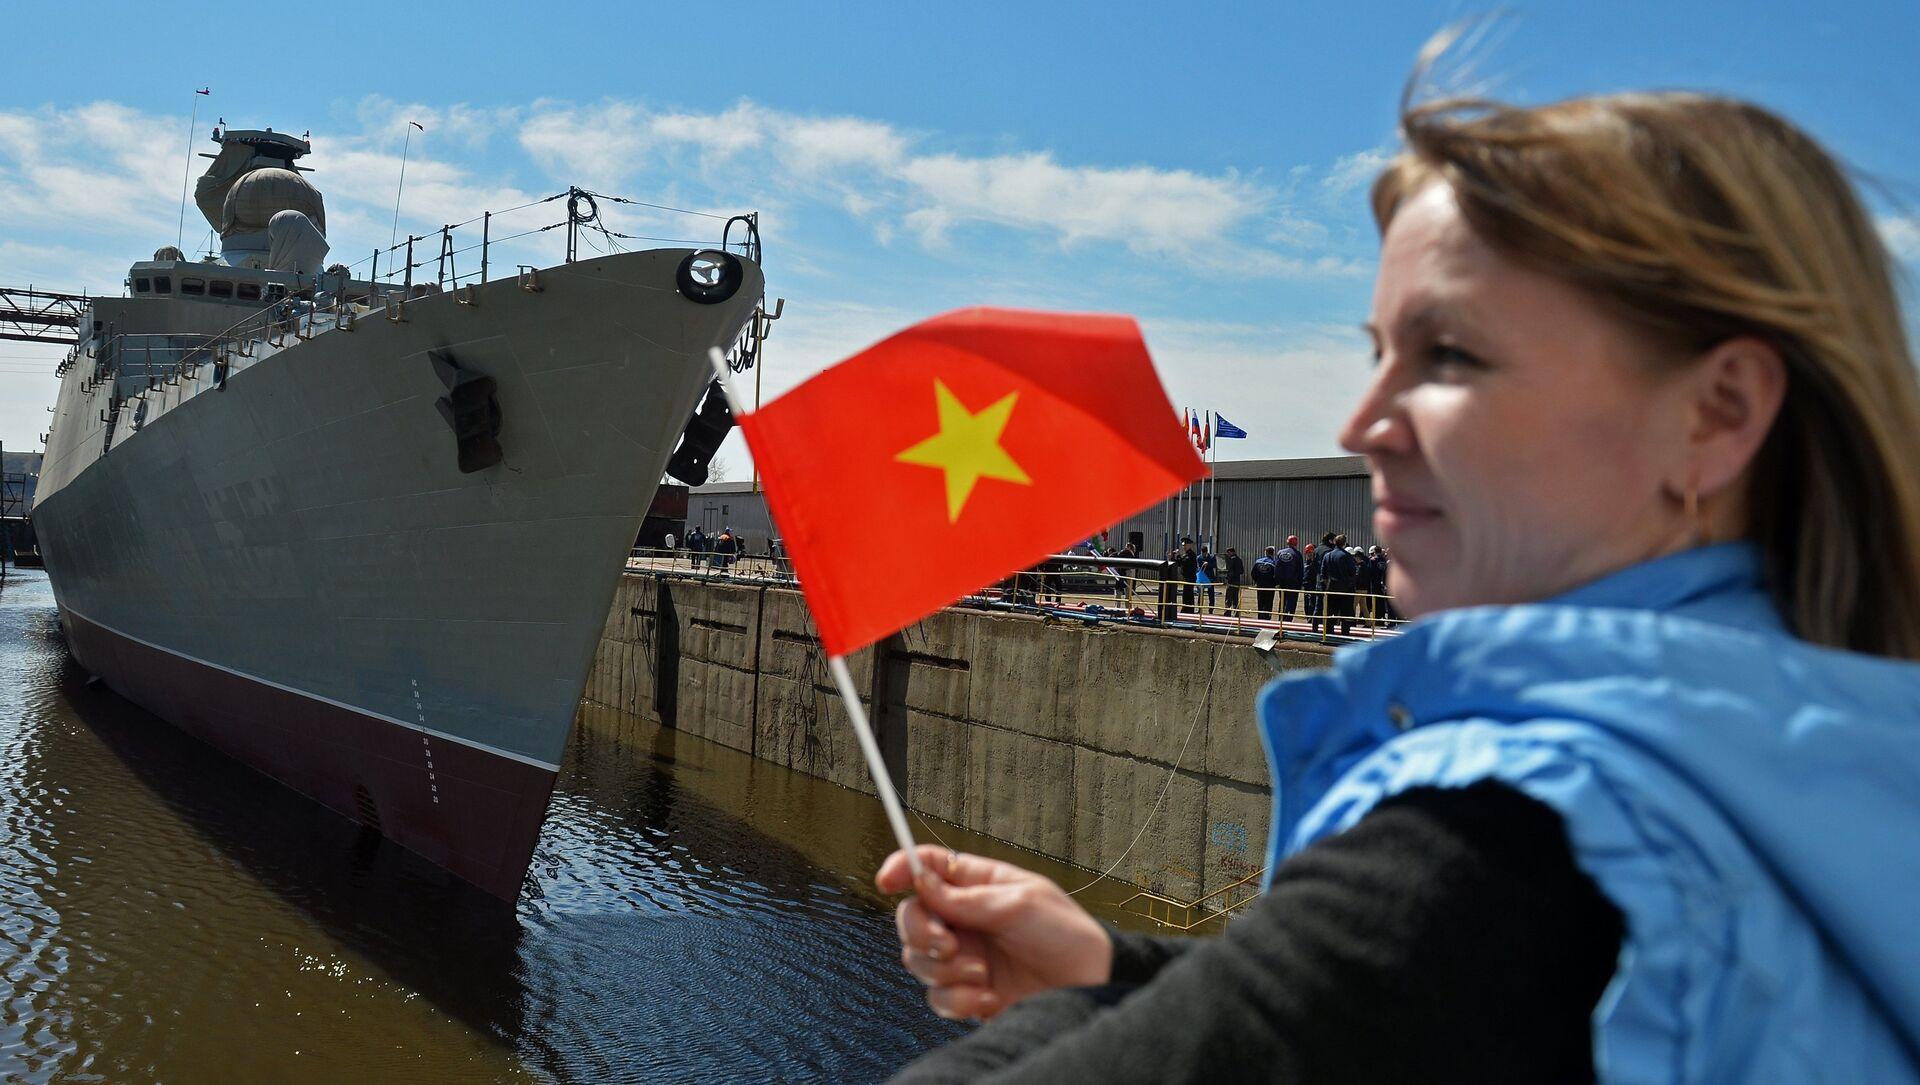 Nghi lễ hạ thủy khu trục hạm Gepard-3.9 ở Zelenodolsk - Sputnik Việt Nam, 1920, 04.09.2021